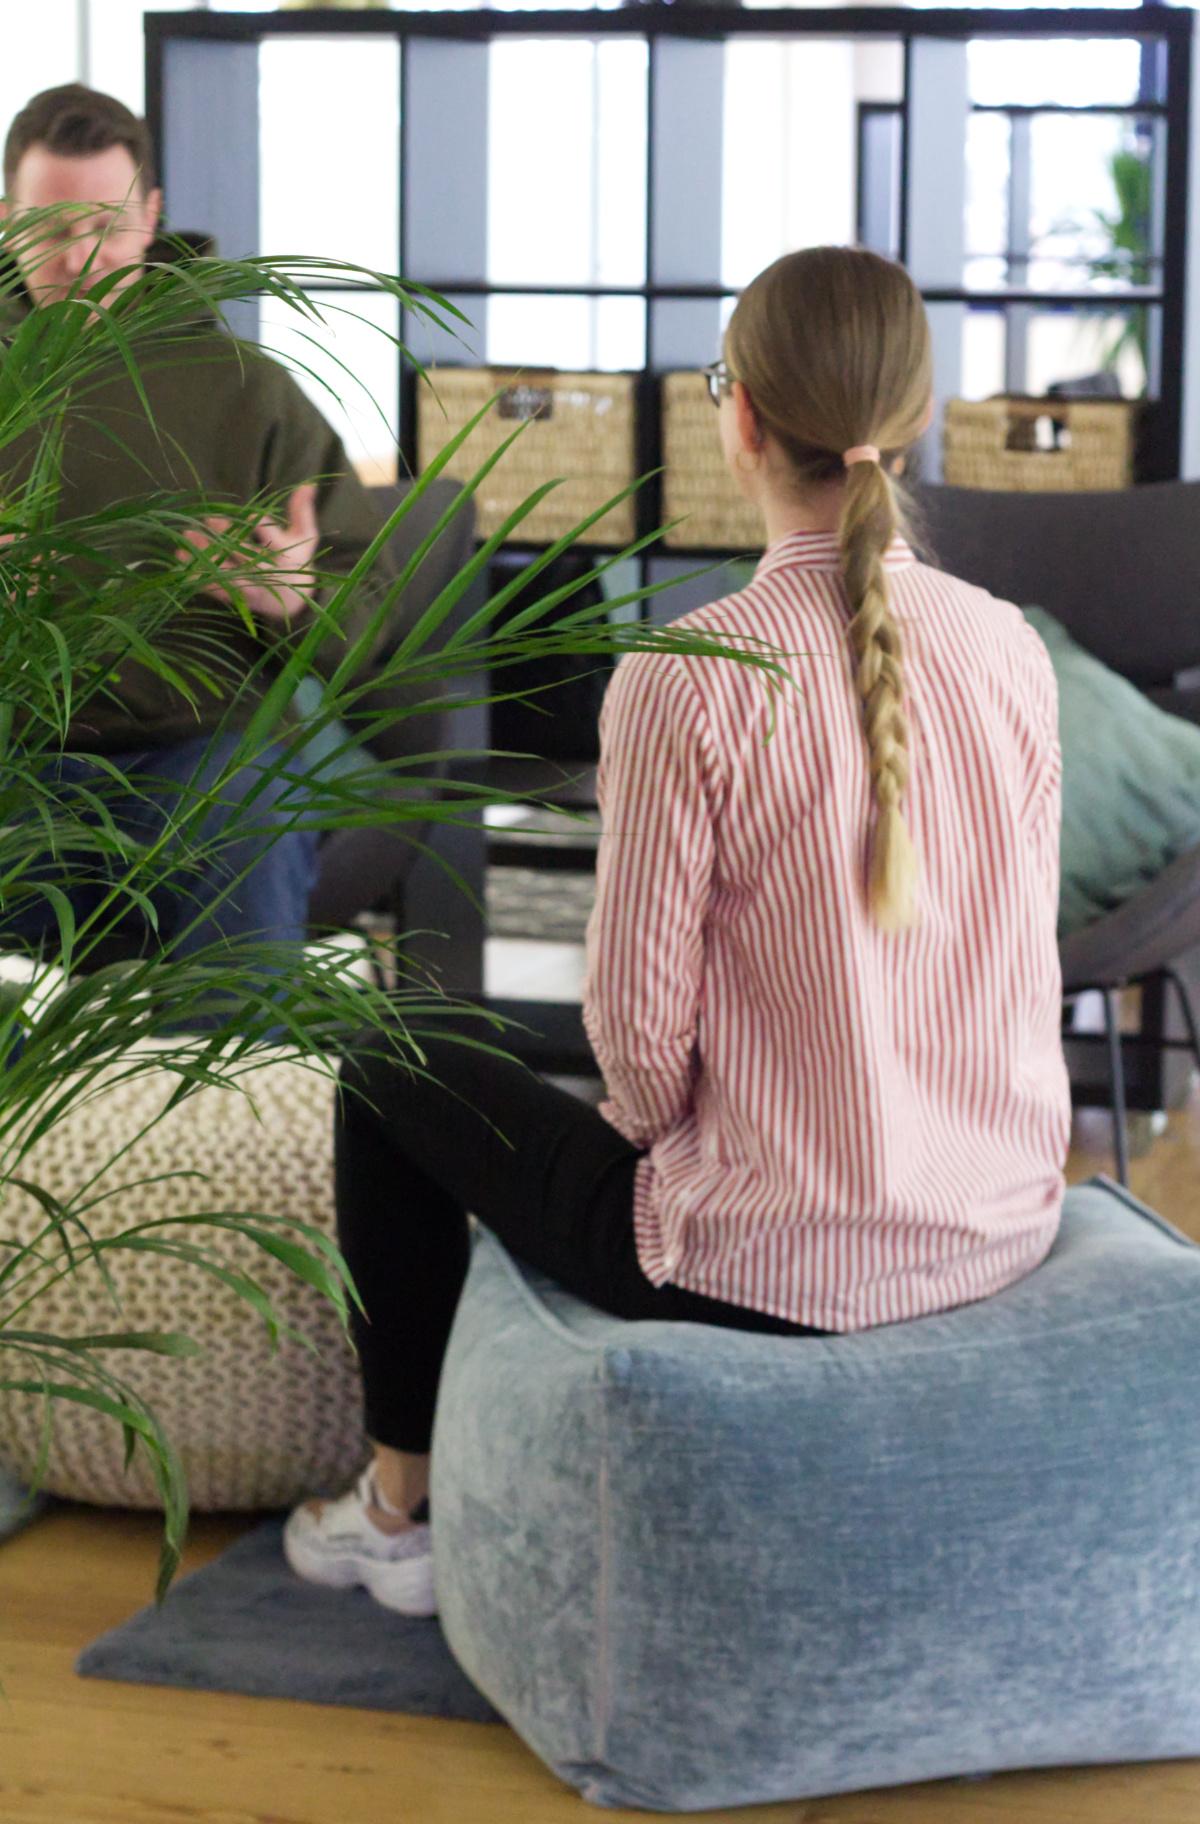 Work Kontor Ahrensburg_Eventfläche_Loungebereich_Coworking_Büro mieten_12